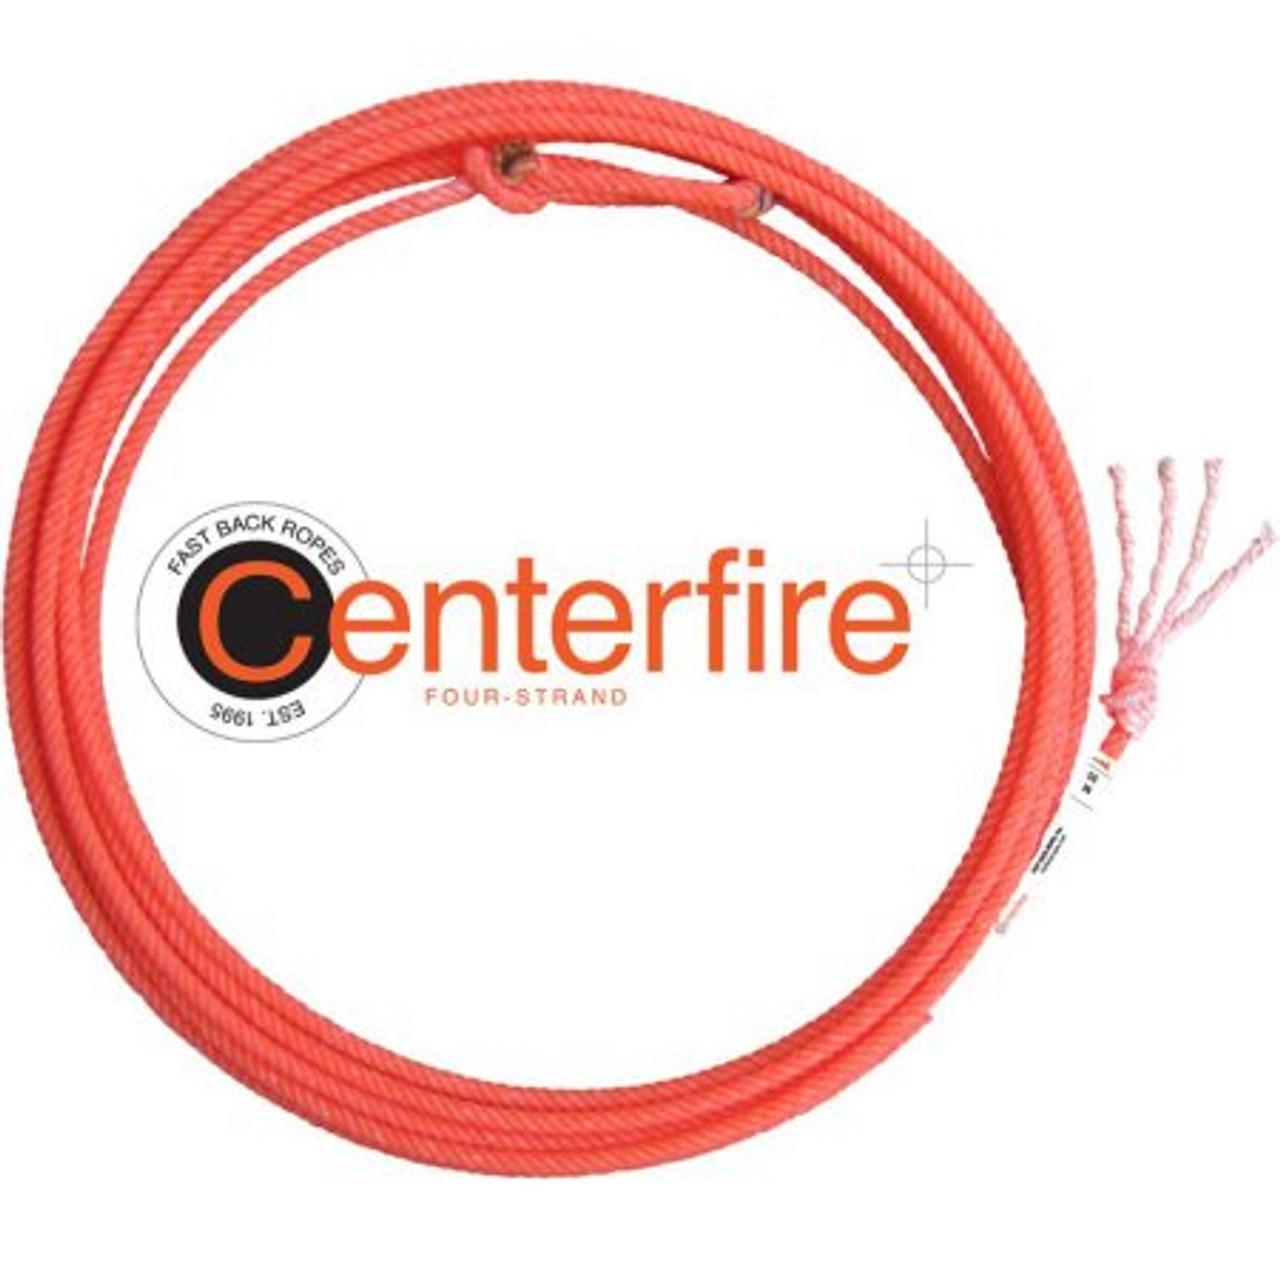 Fast Back Centerfire - Heel Rope 35